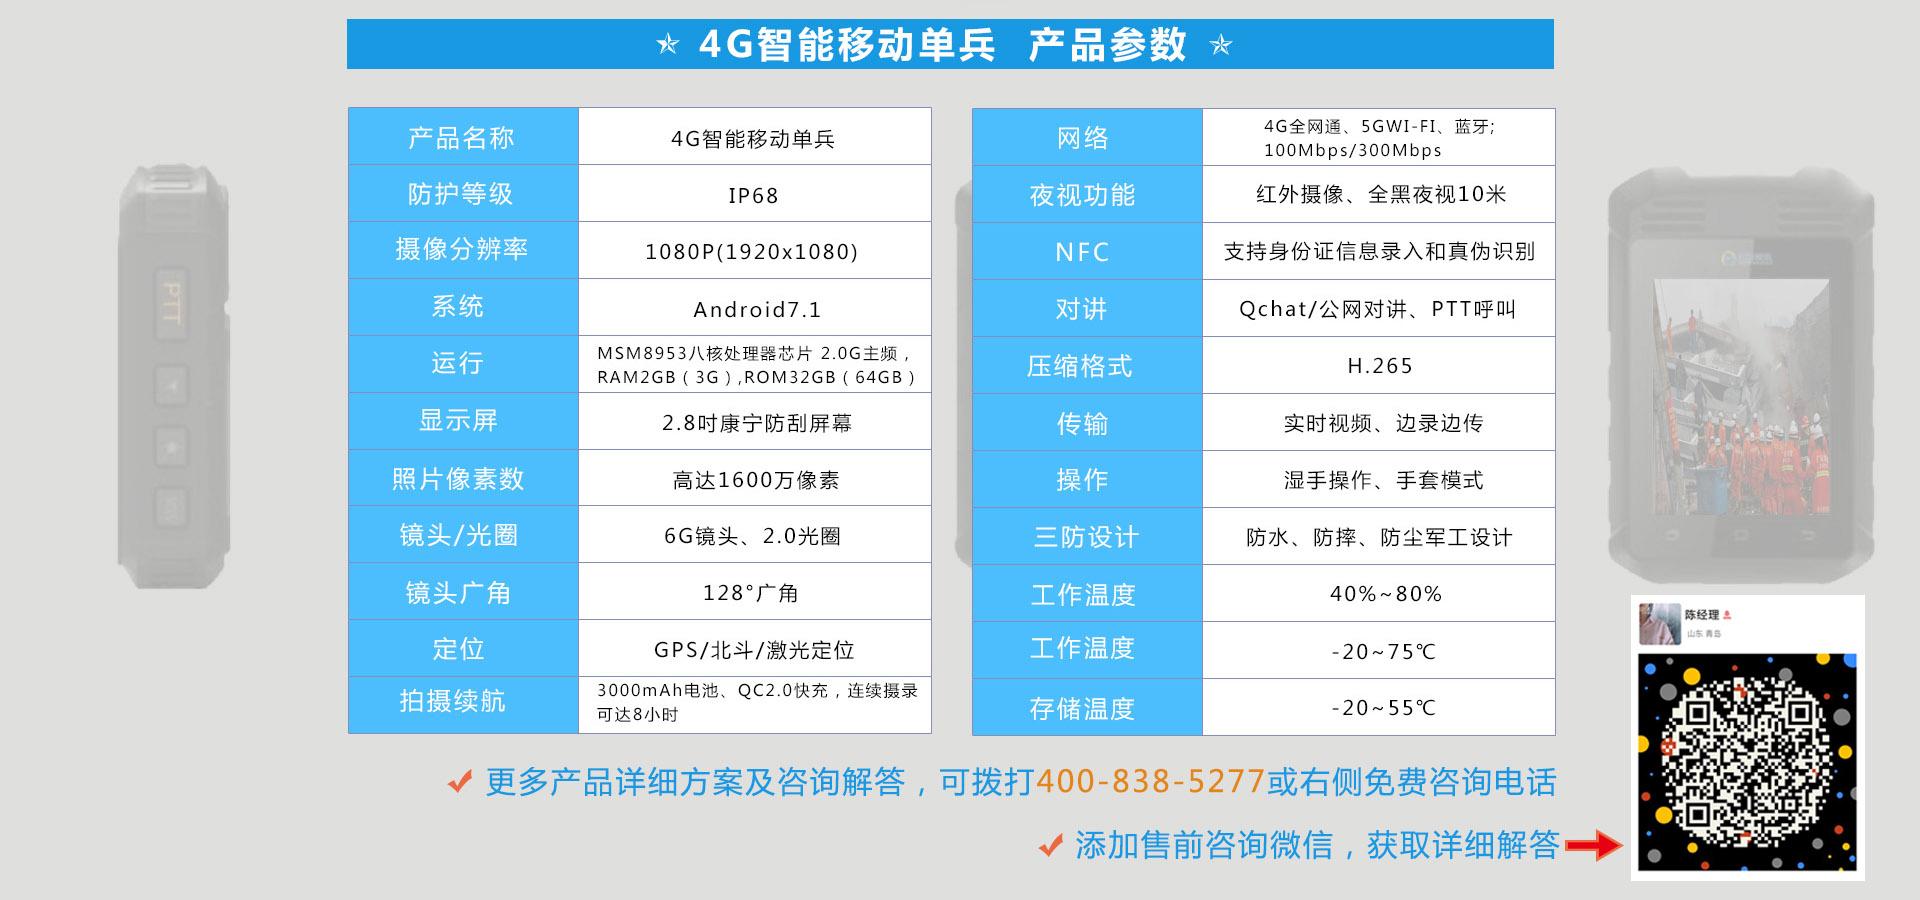 4G智能移动单兵参数.jpg